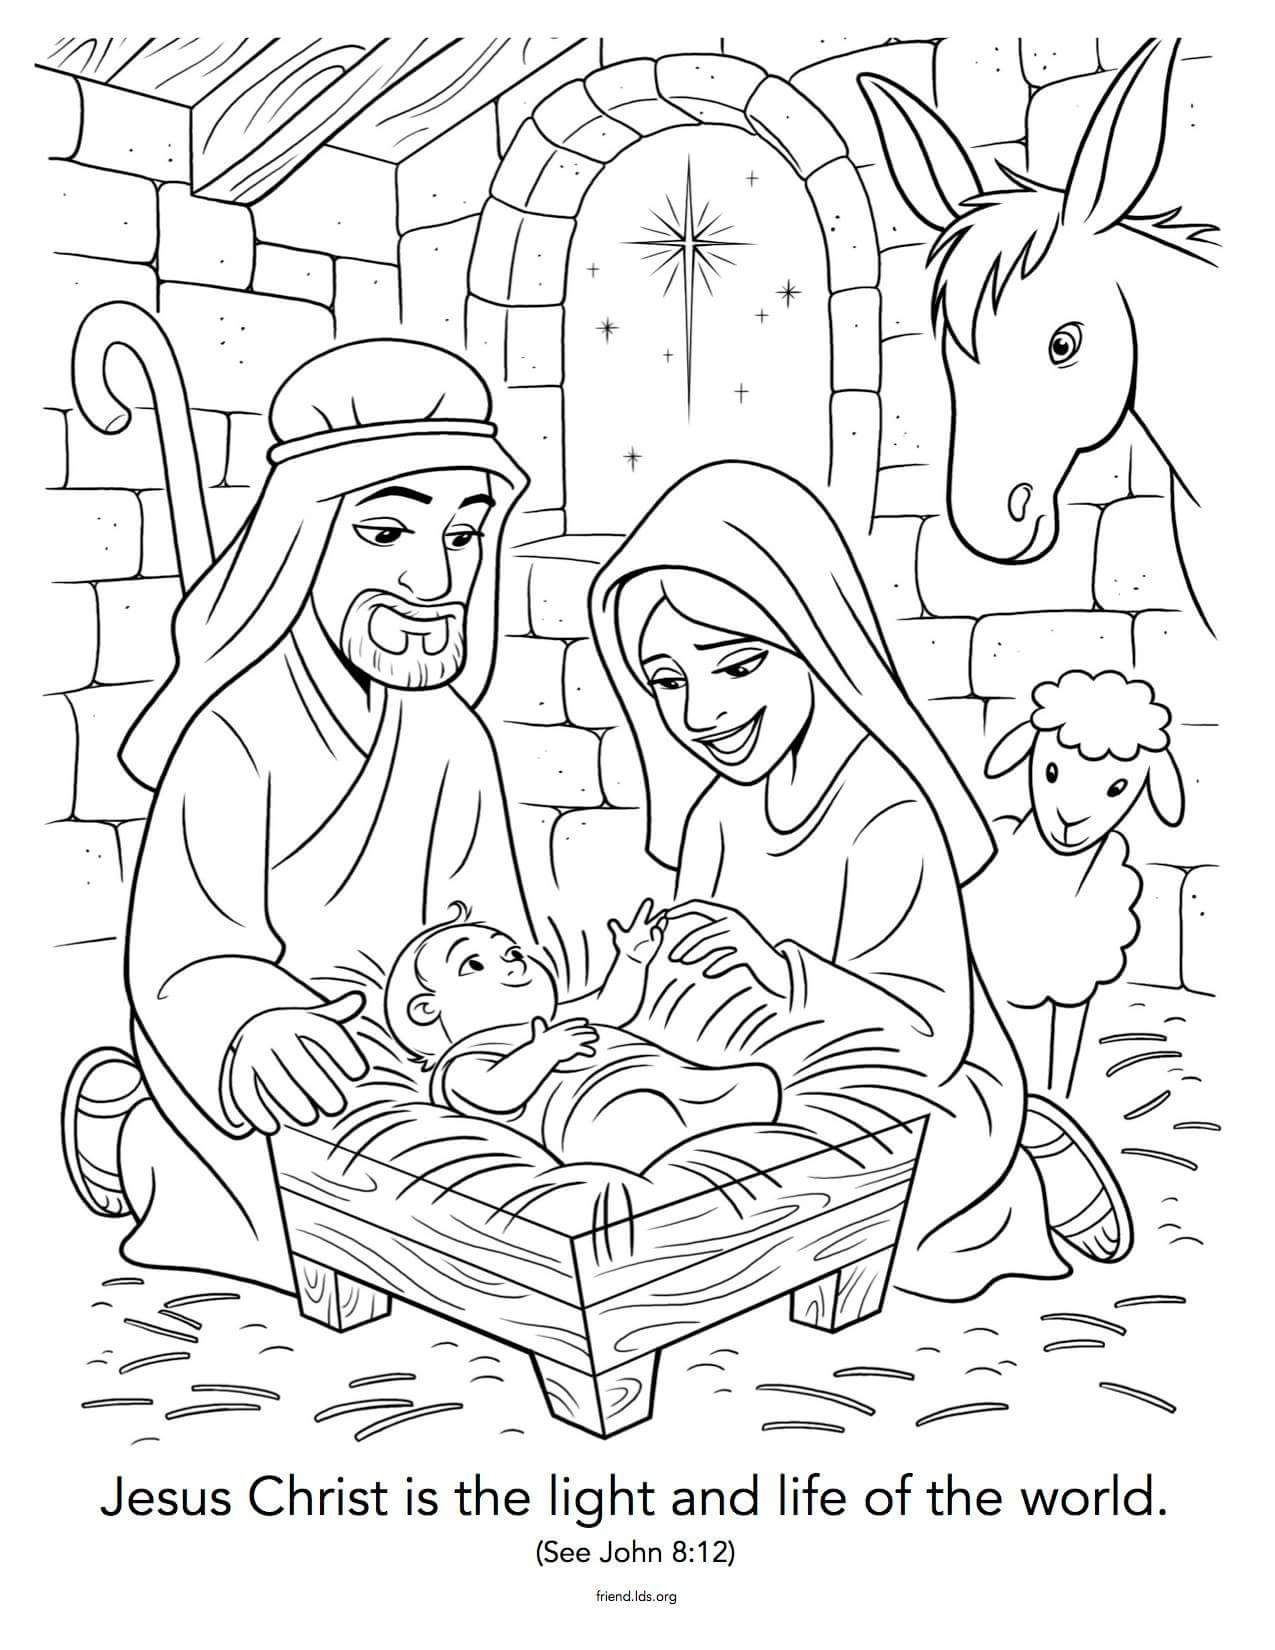 25351935 10154995819181781 3738162634401311698 O Jpg 1 275 1 650 Pixels Jesus Coloring Pages Nativity Coloring Pages Christmas Coloring Pages